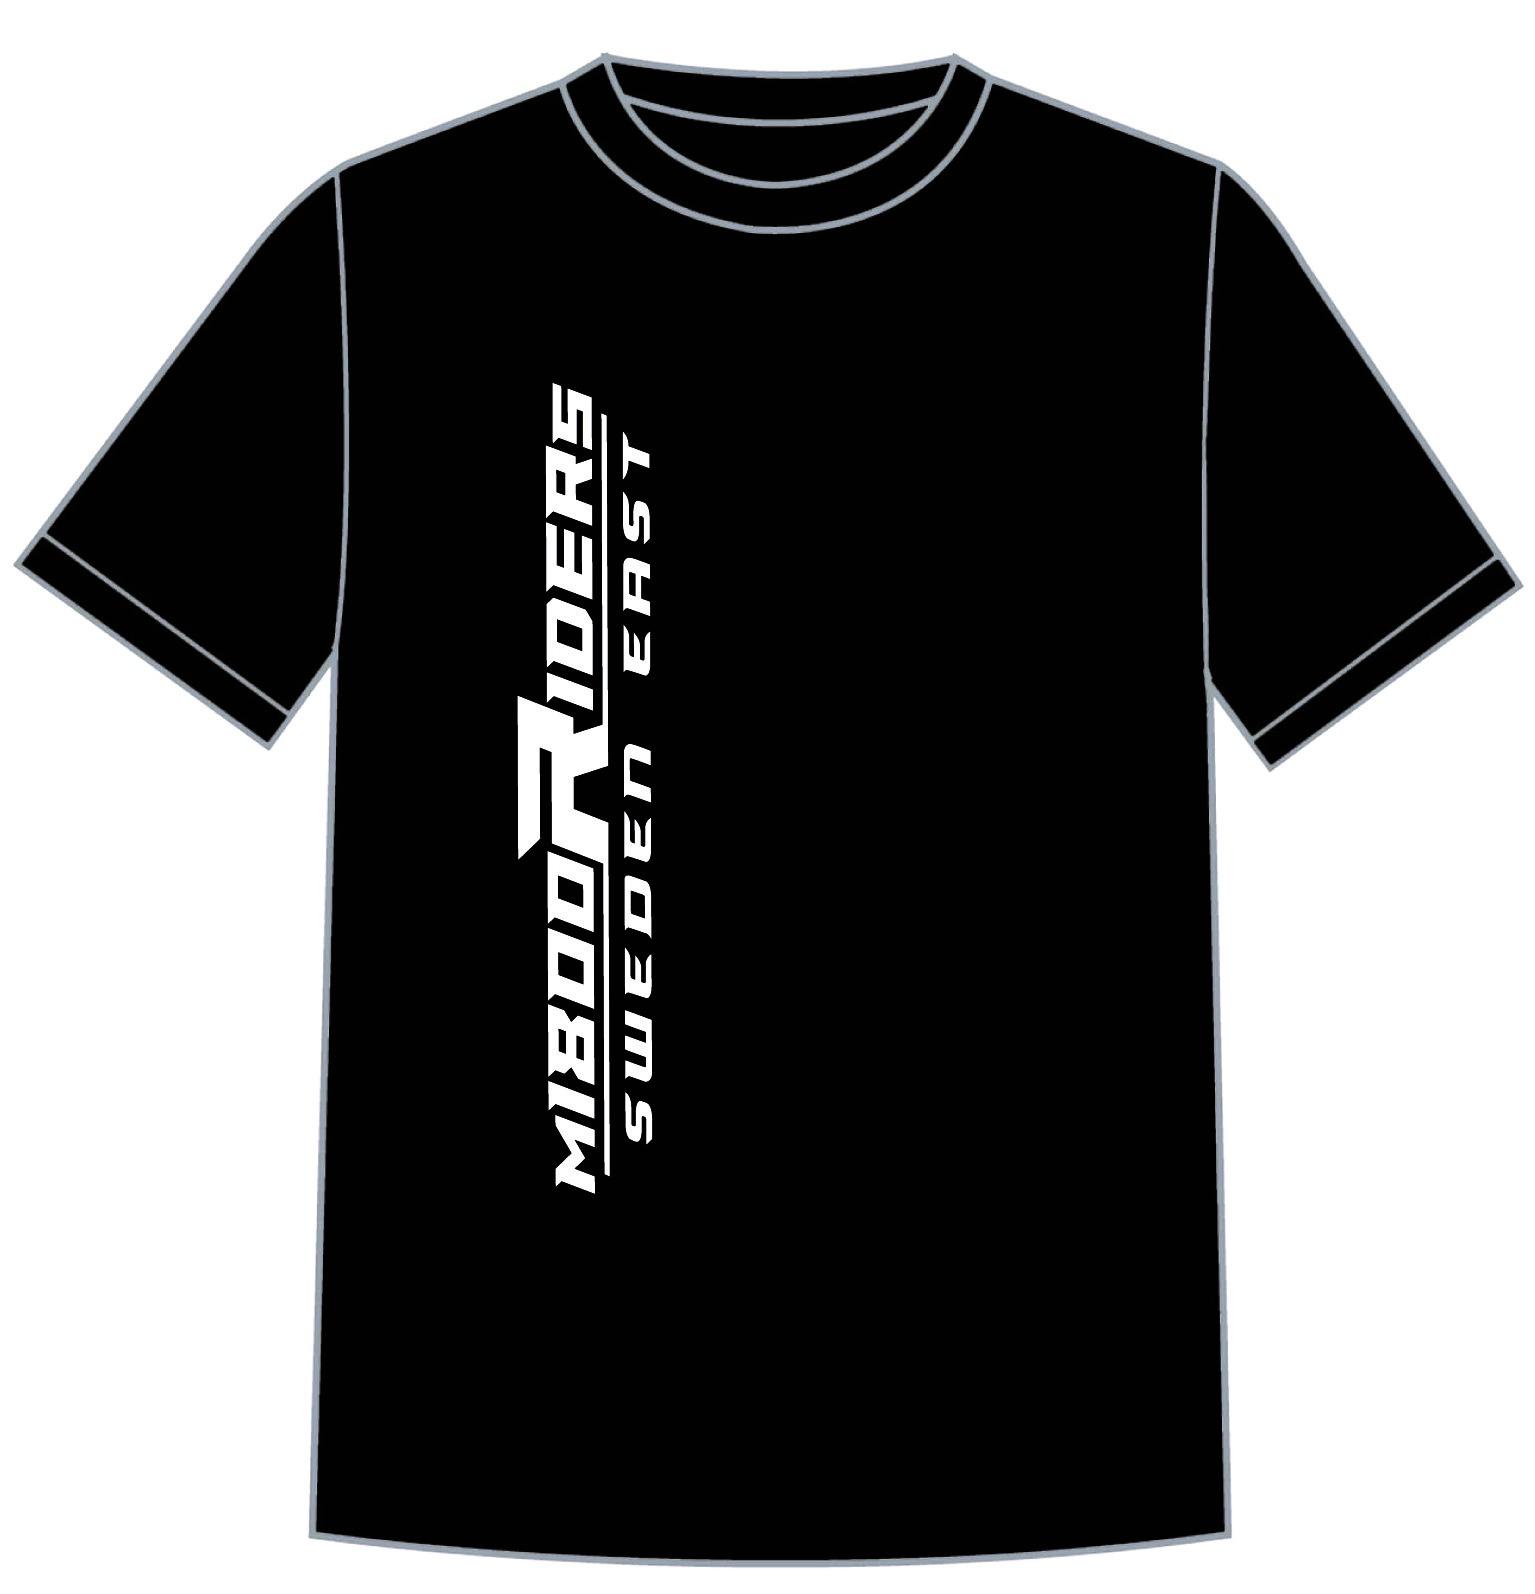 Sweden East T-shirt